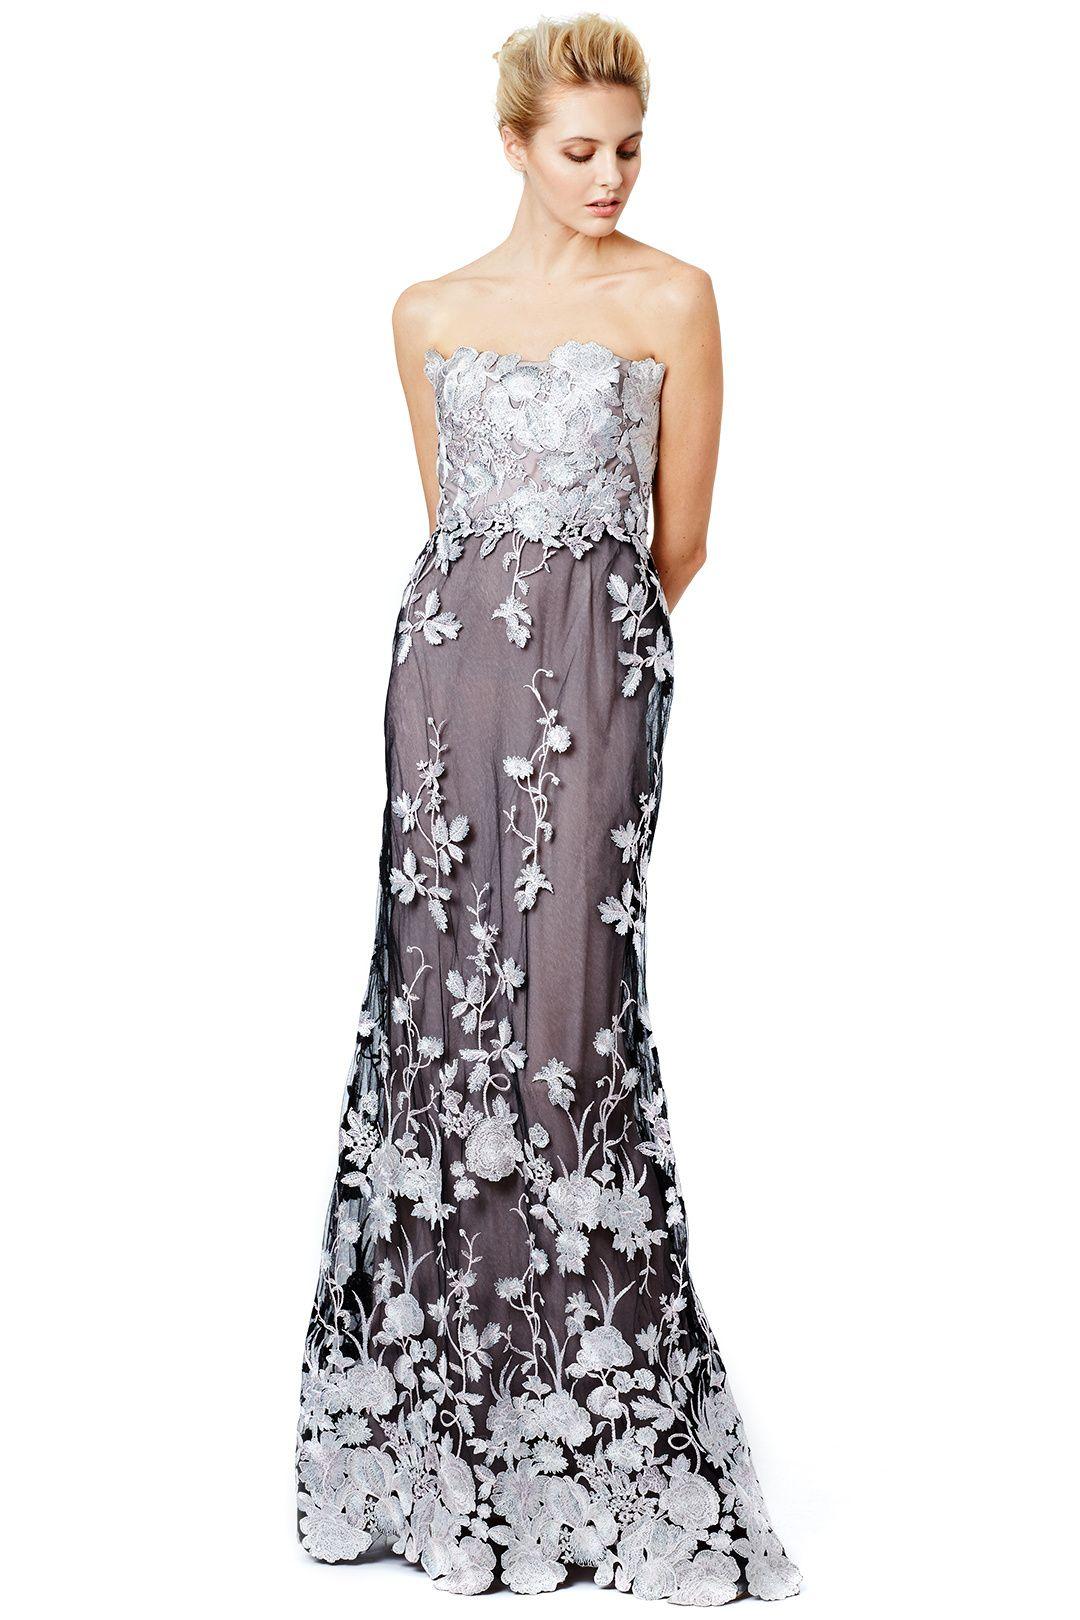 Marchesa Notte Fontaine Gown Gowns Dresses Fancy Dress Accessories